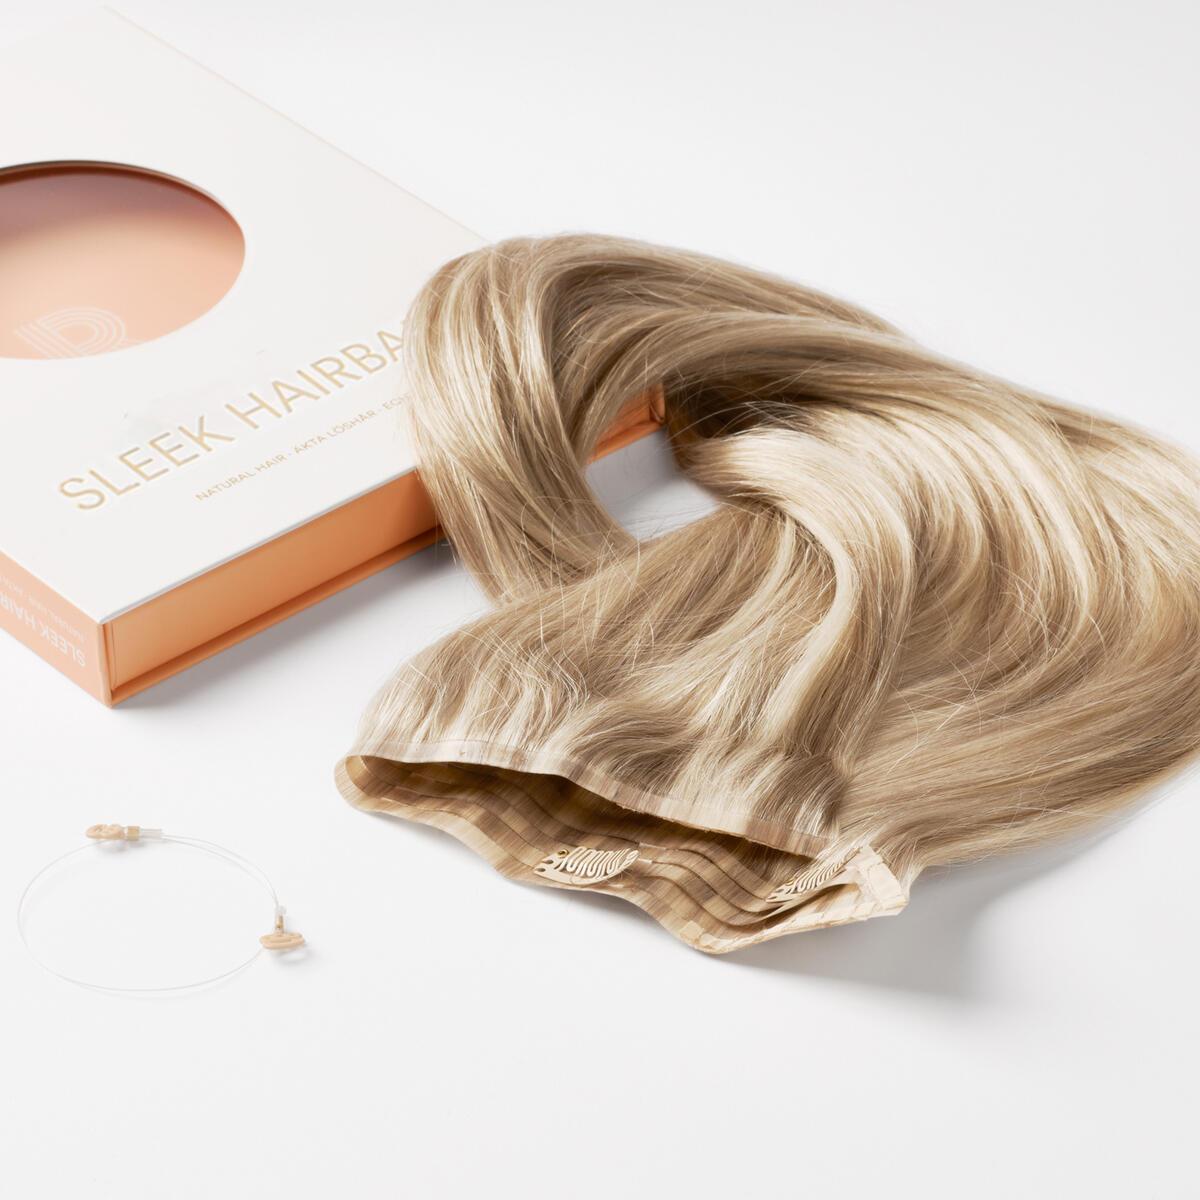 Sleek Hairband M7.3/10.8 Cendre Ash Blonde Mix 50 cm